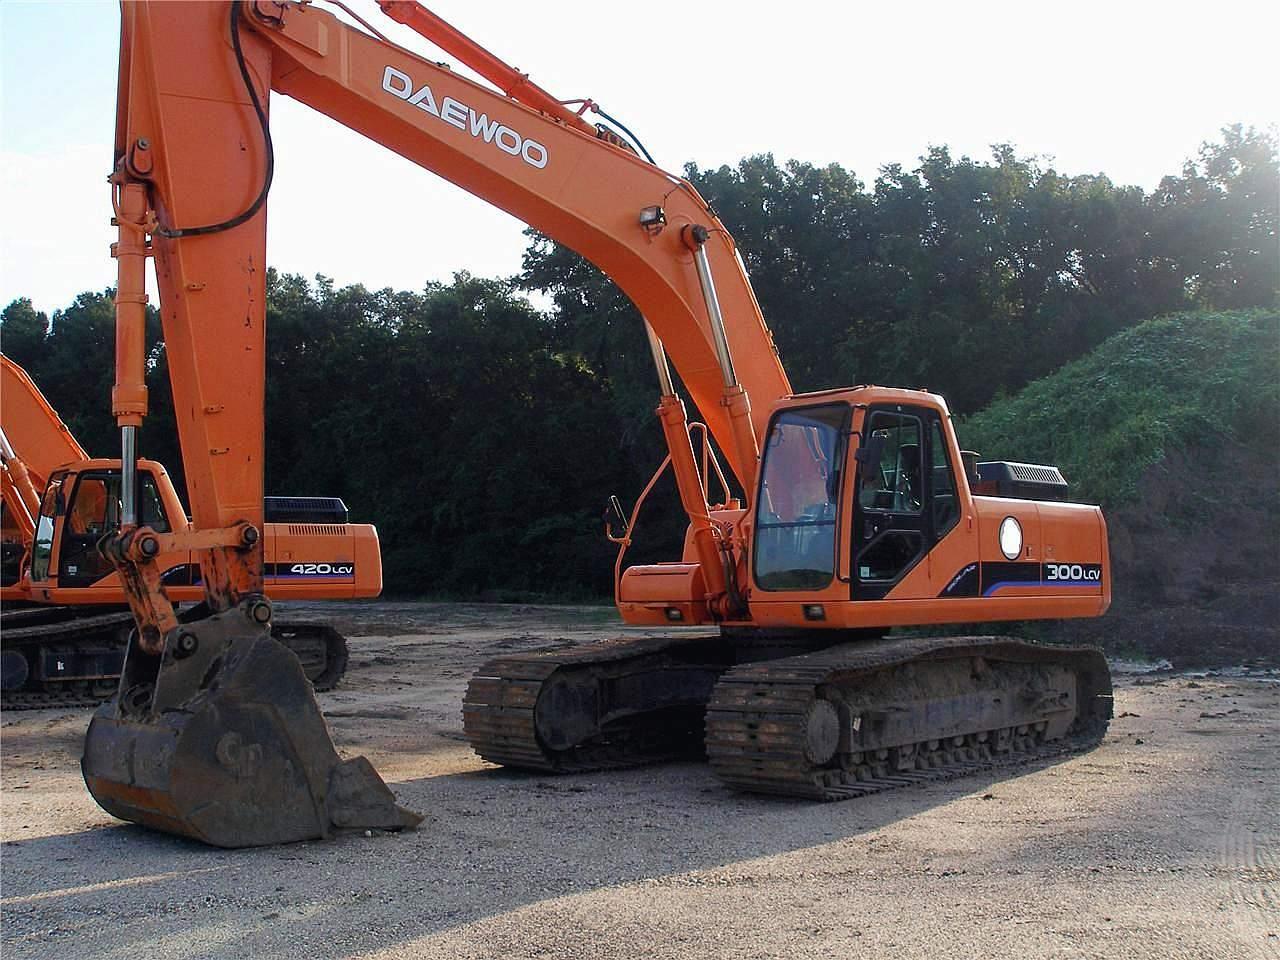 daewoo-excavator2